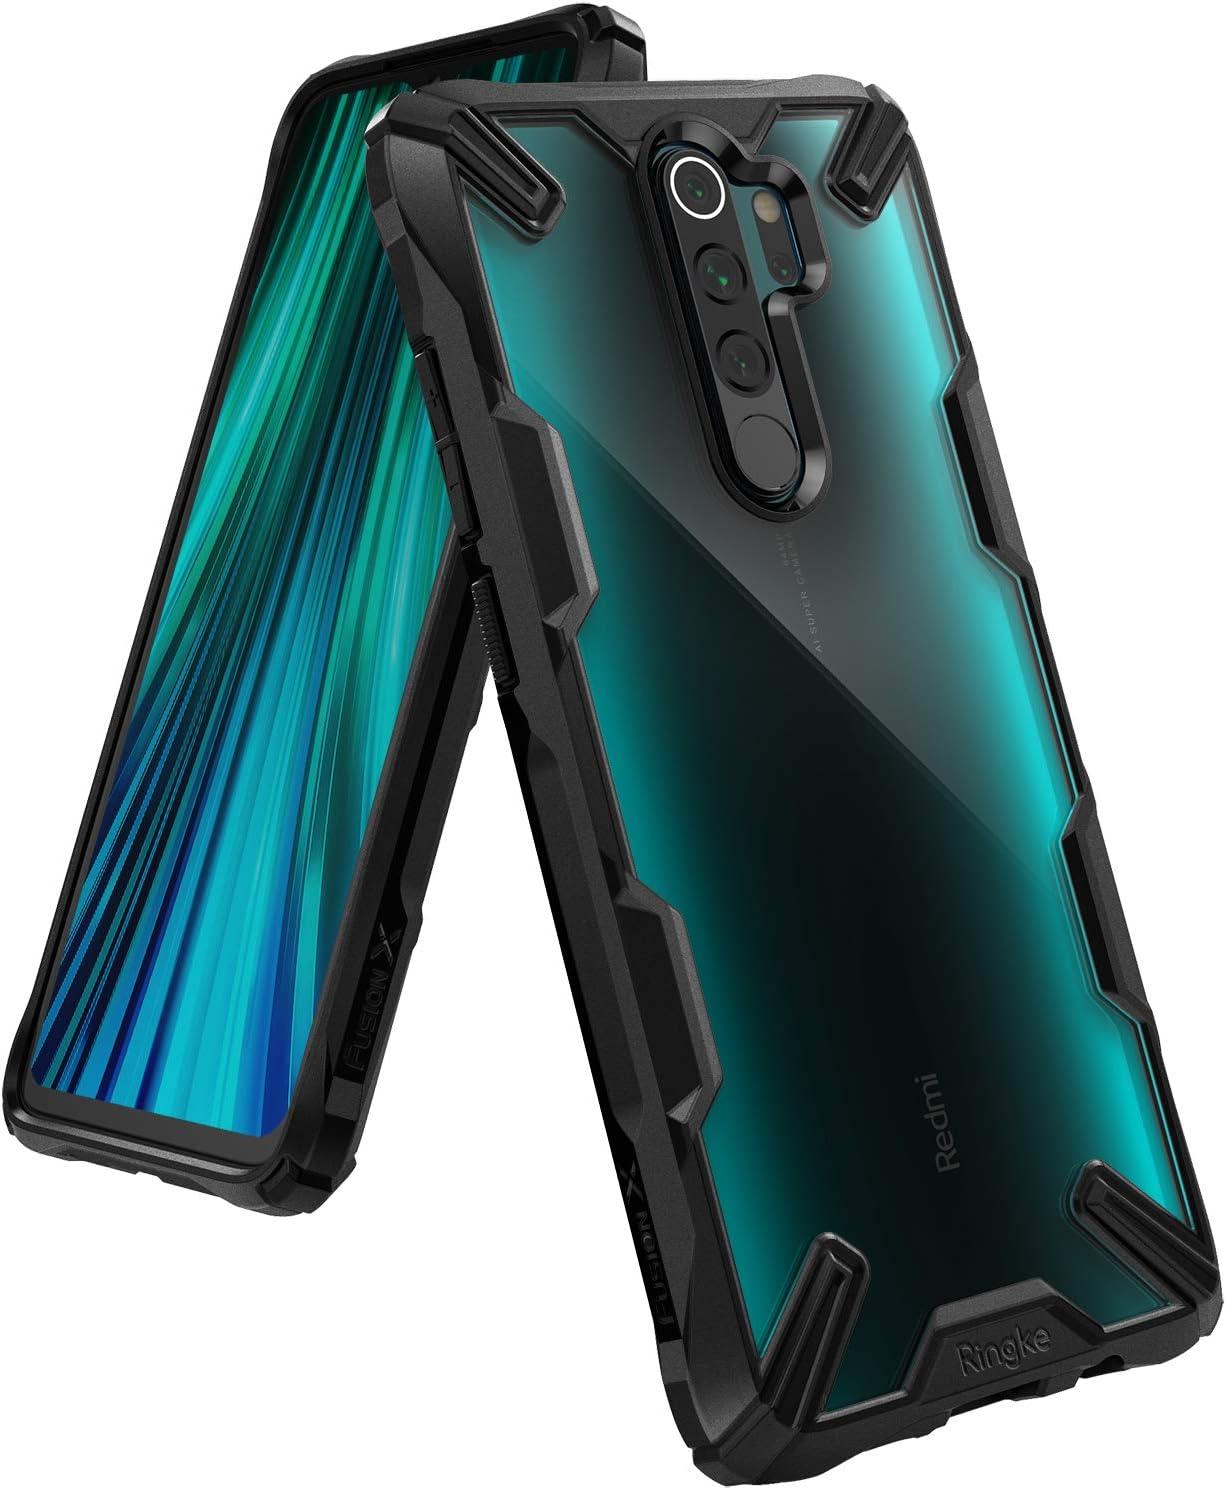 Ringke Fusion-X Diseñado para Funda Xiaomi Redmi Note 8 Pro, Transparente al Dorso Carcasa Redmi Note 8 Pro 6.53